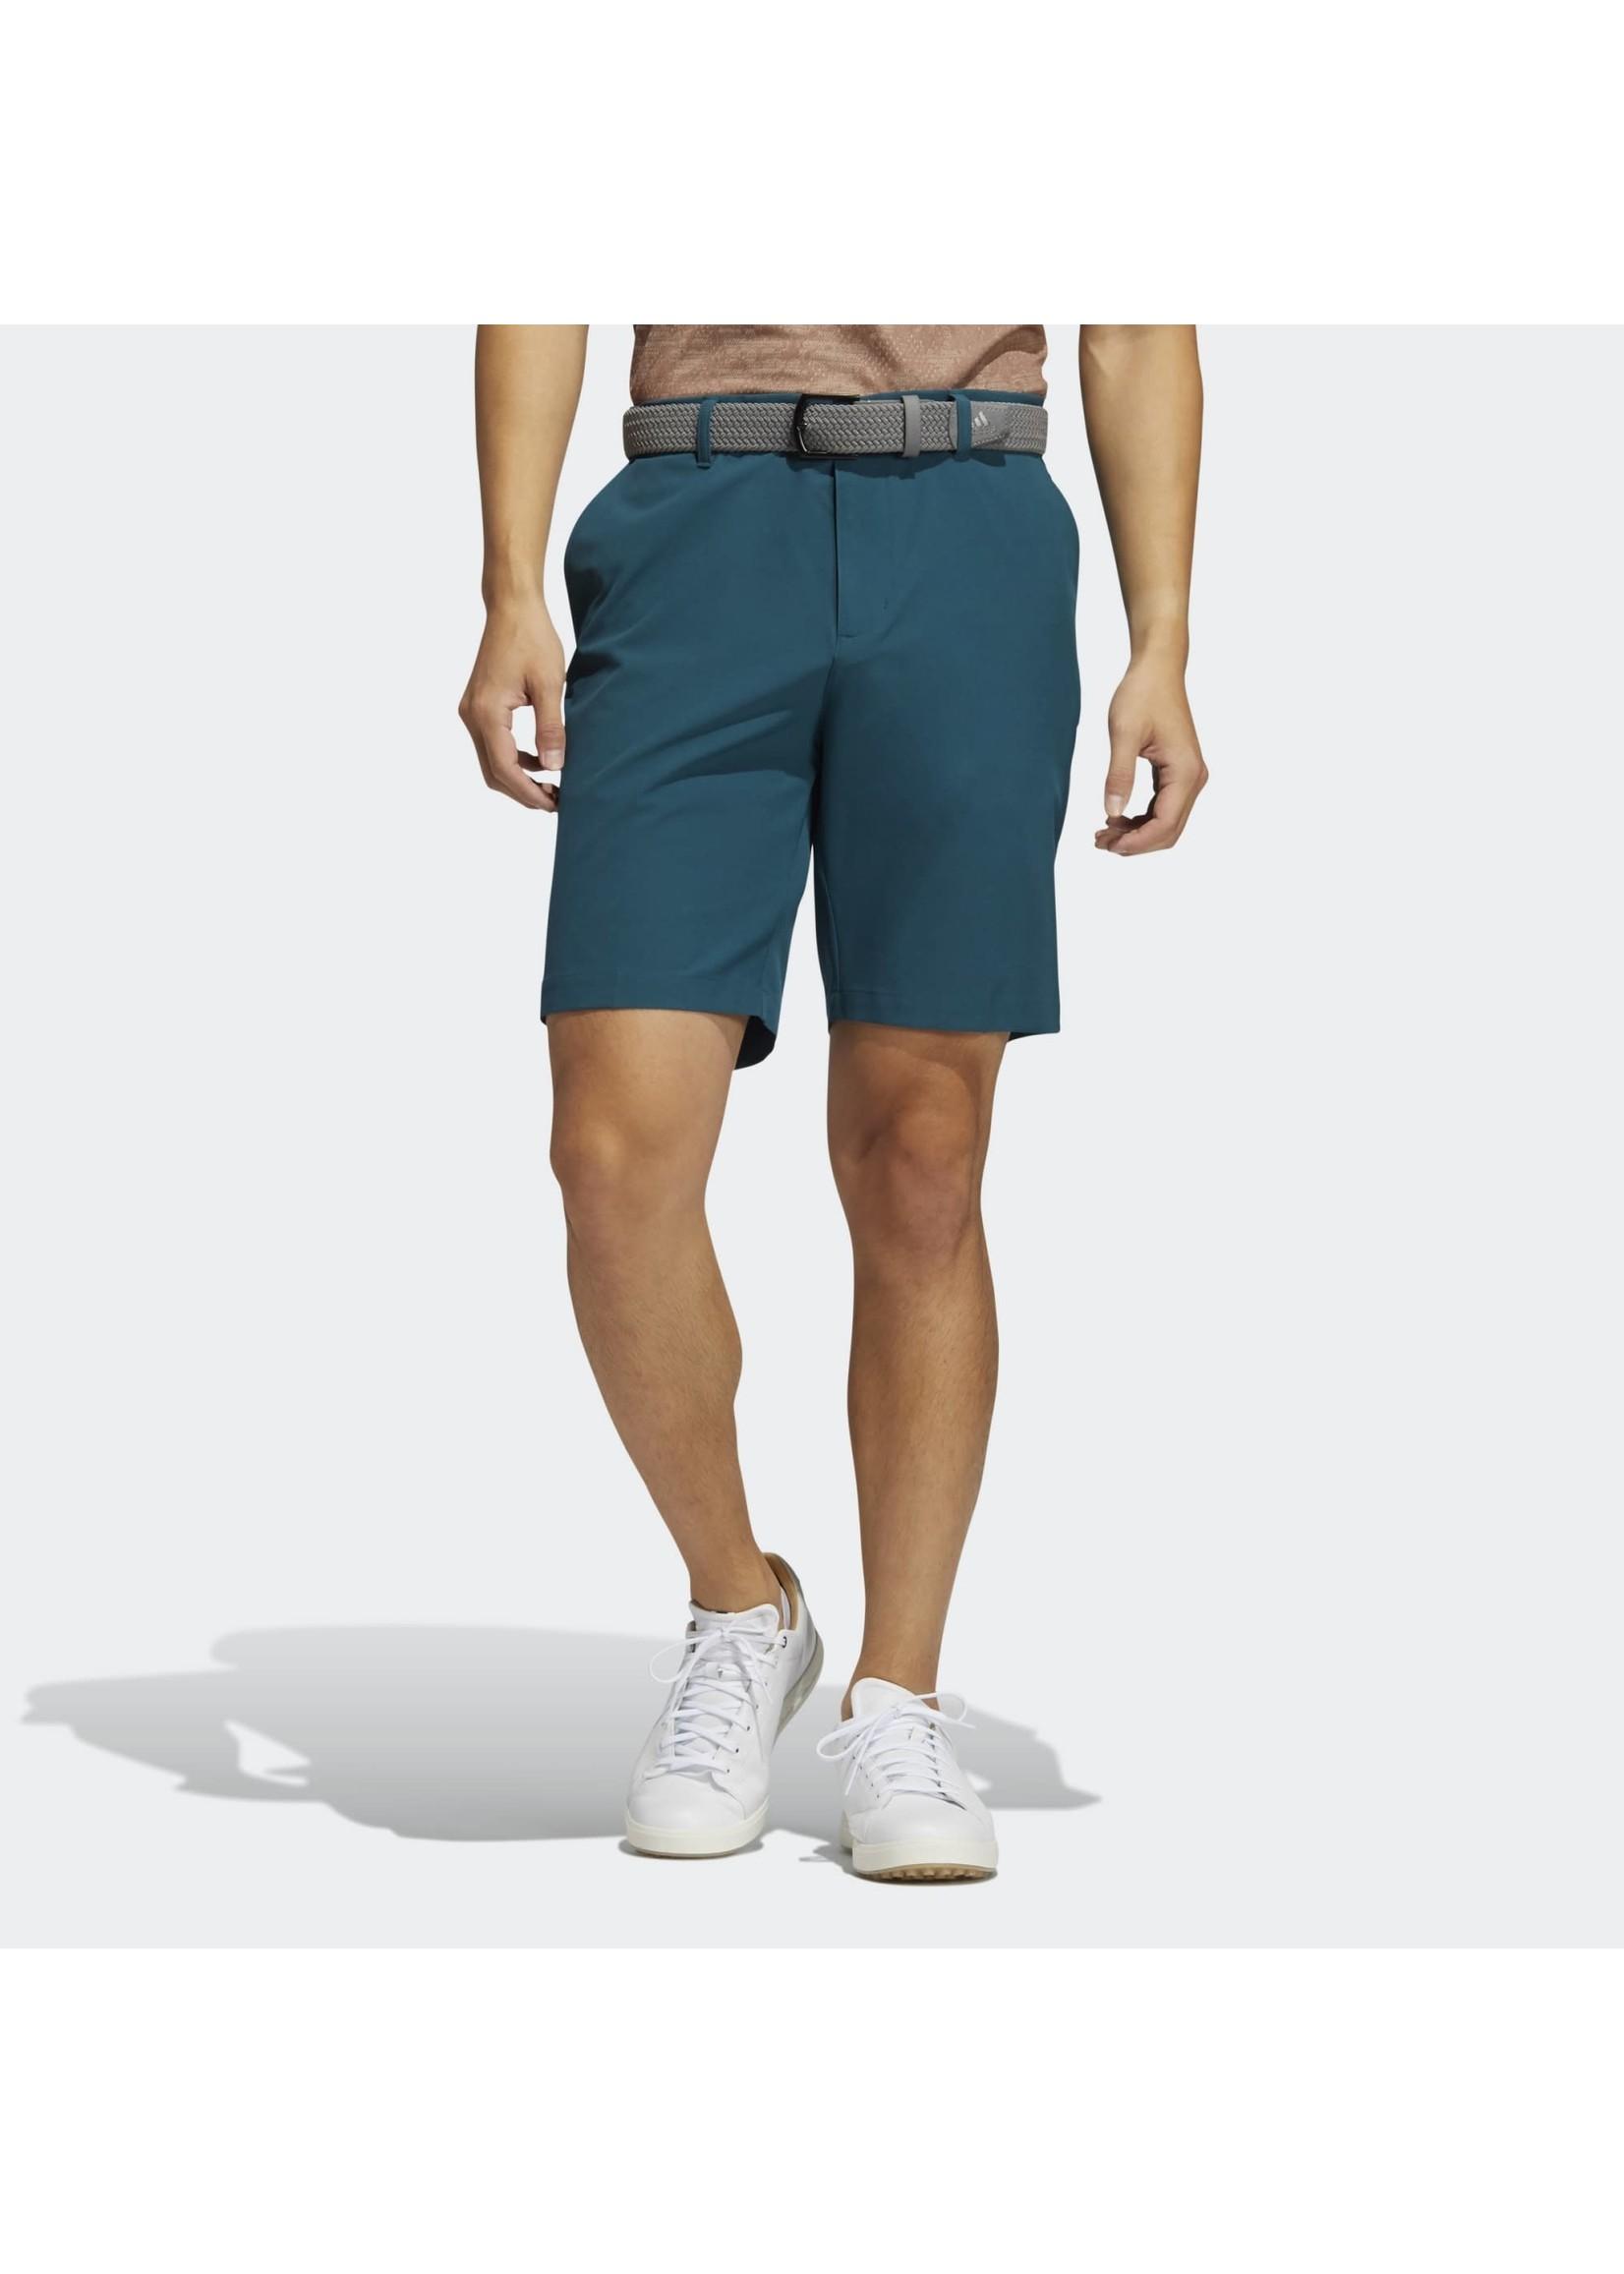 Adidas Adidas Ultimate365  Mens Golf Short, Wild Teal